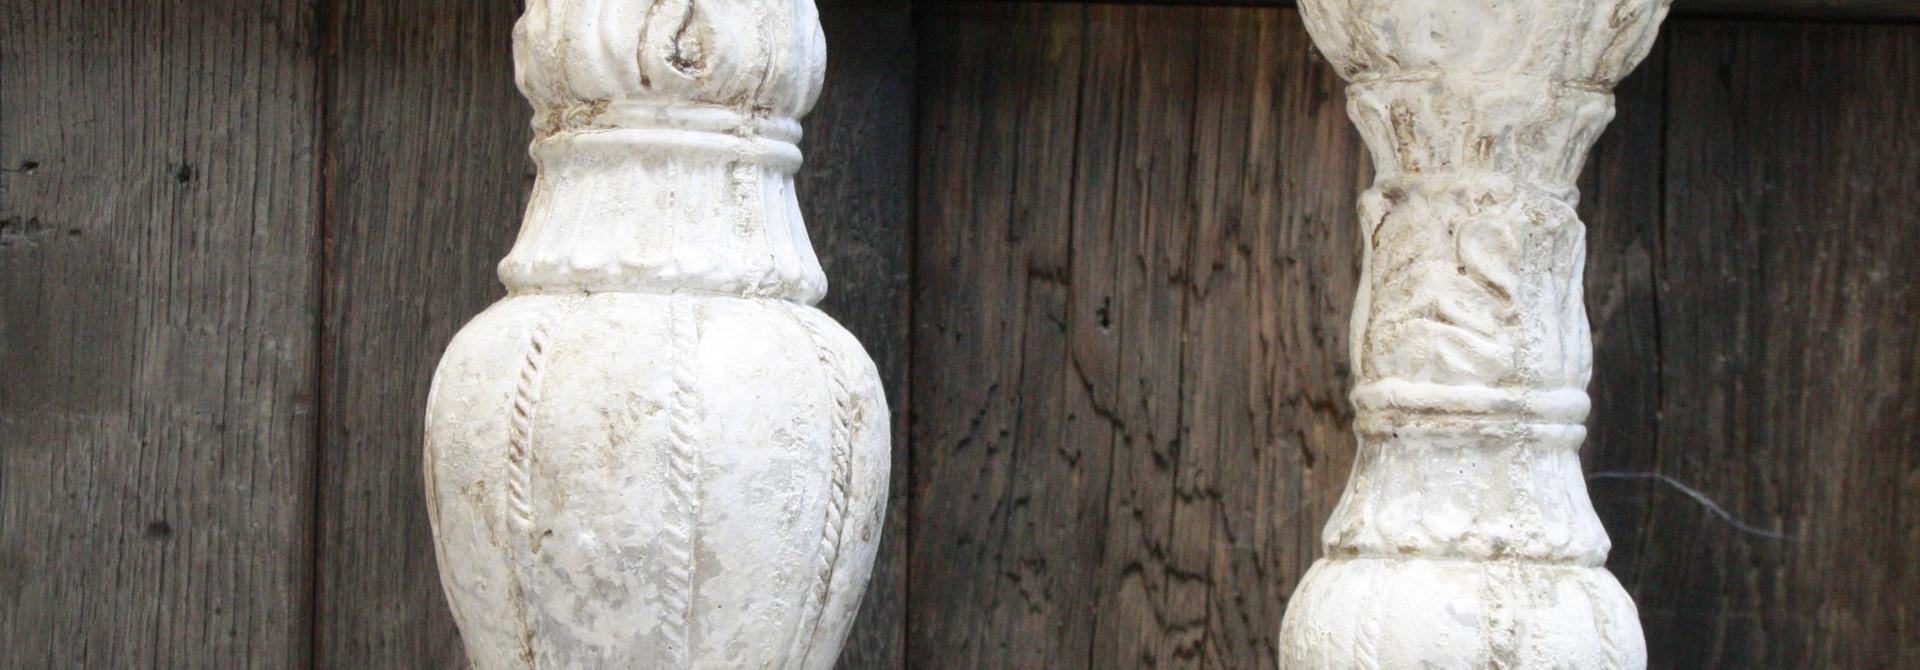 Stenen PTMD Kaarshouder 44&34 cm set van 2